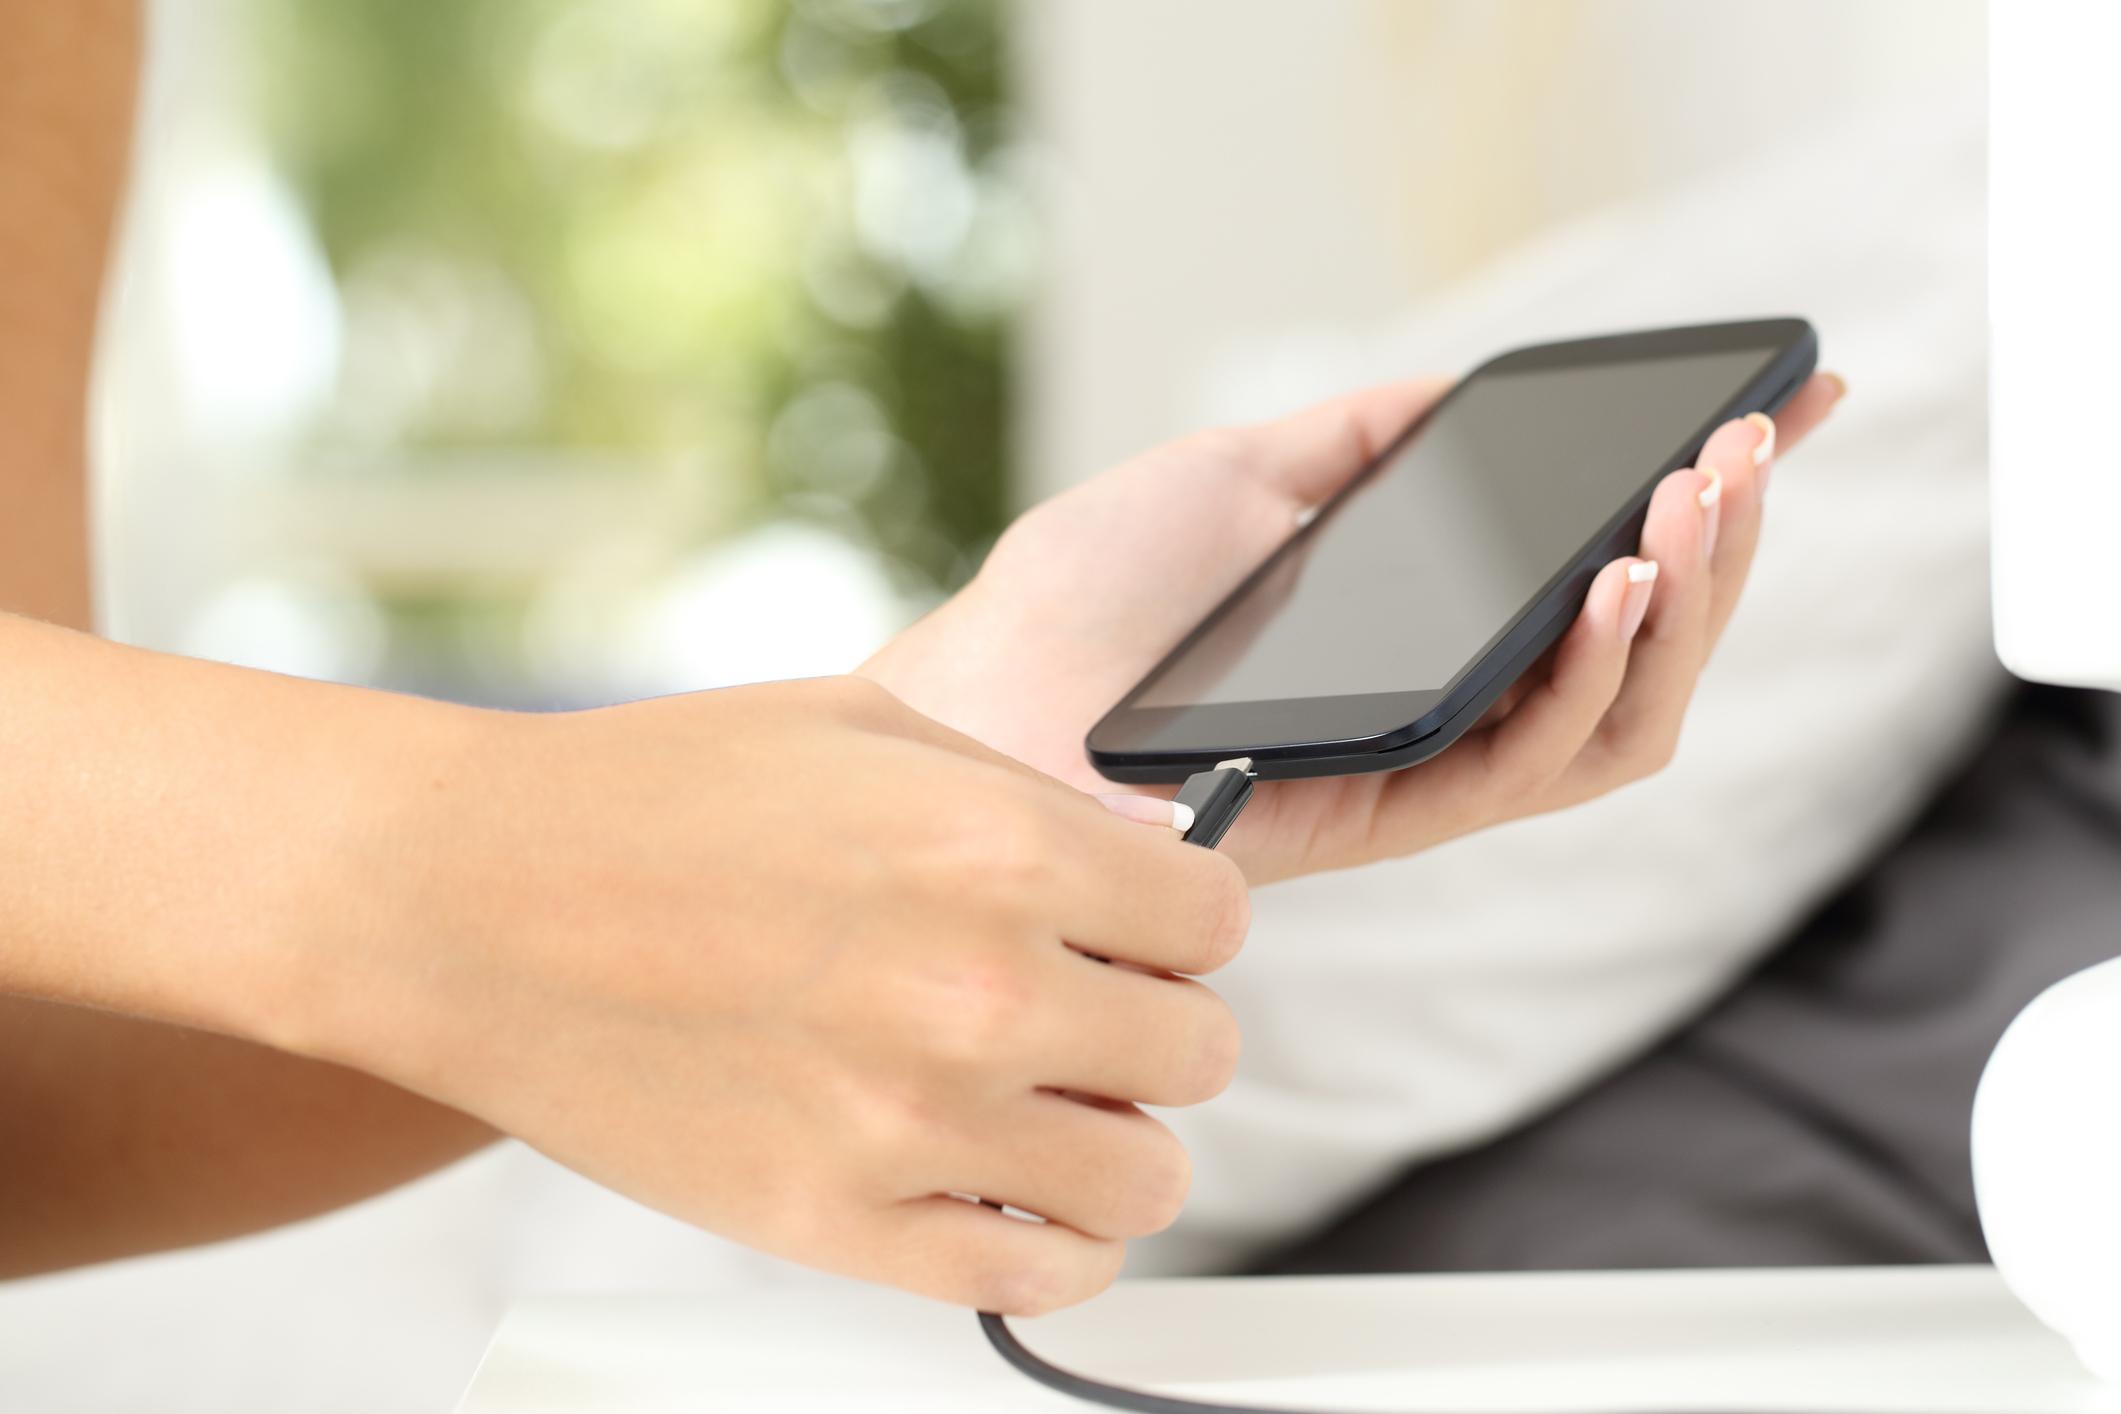 Samsung Galaxy S6 Akkulaufzeit Tipps